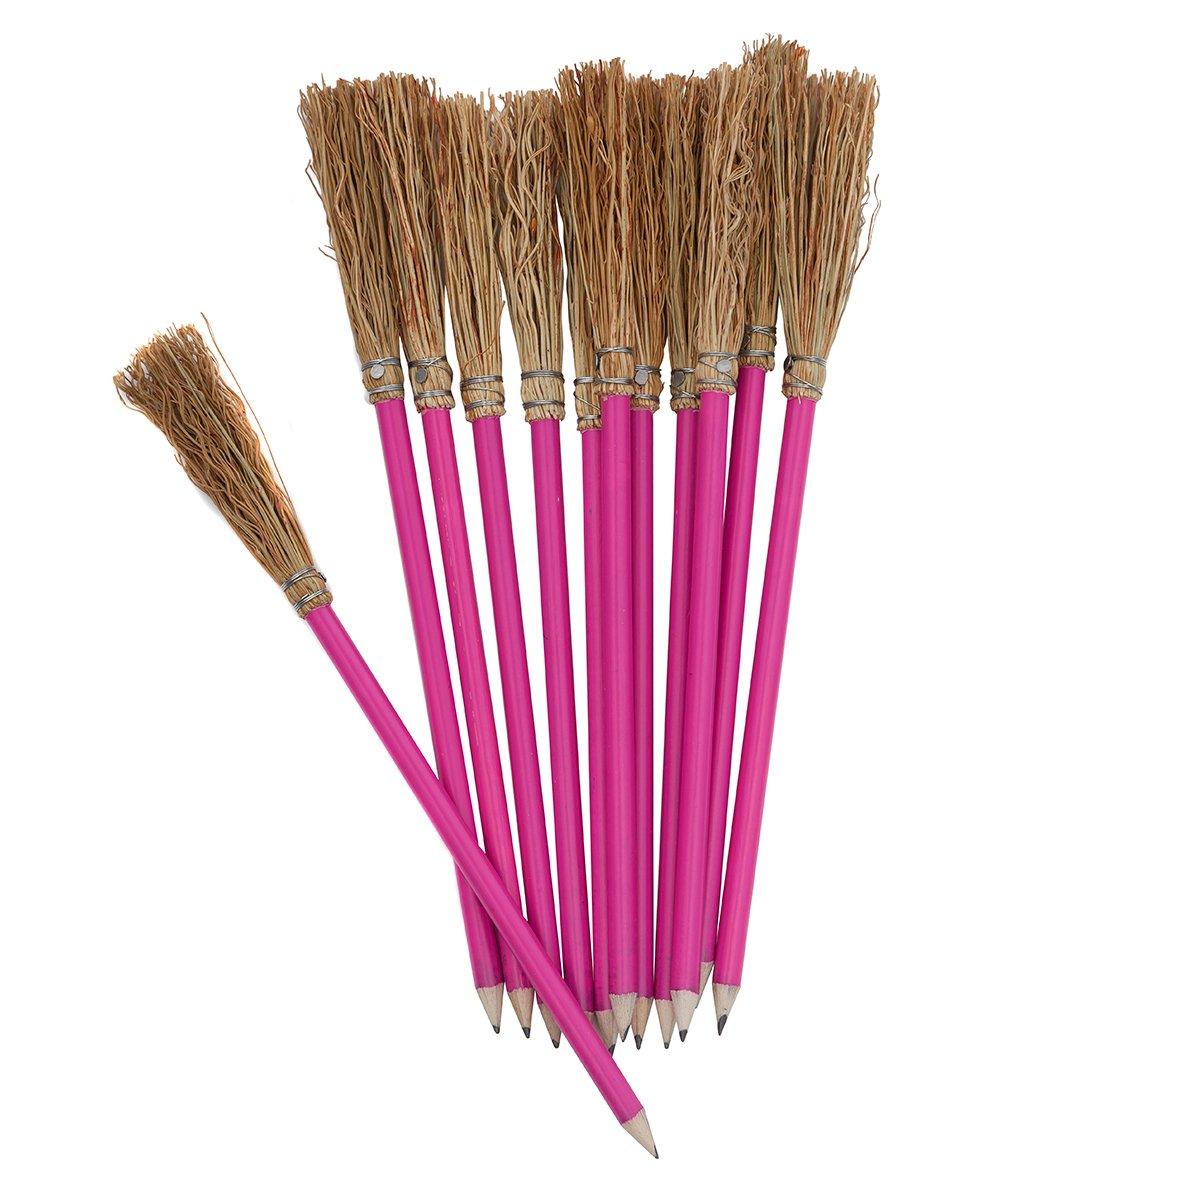 12 Pencil –  Pink Fantasy Colour –  26 cm Mendi